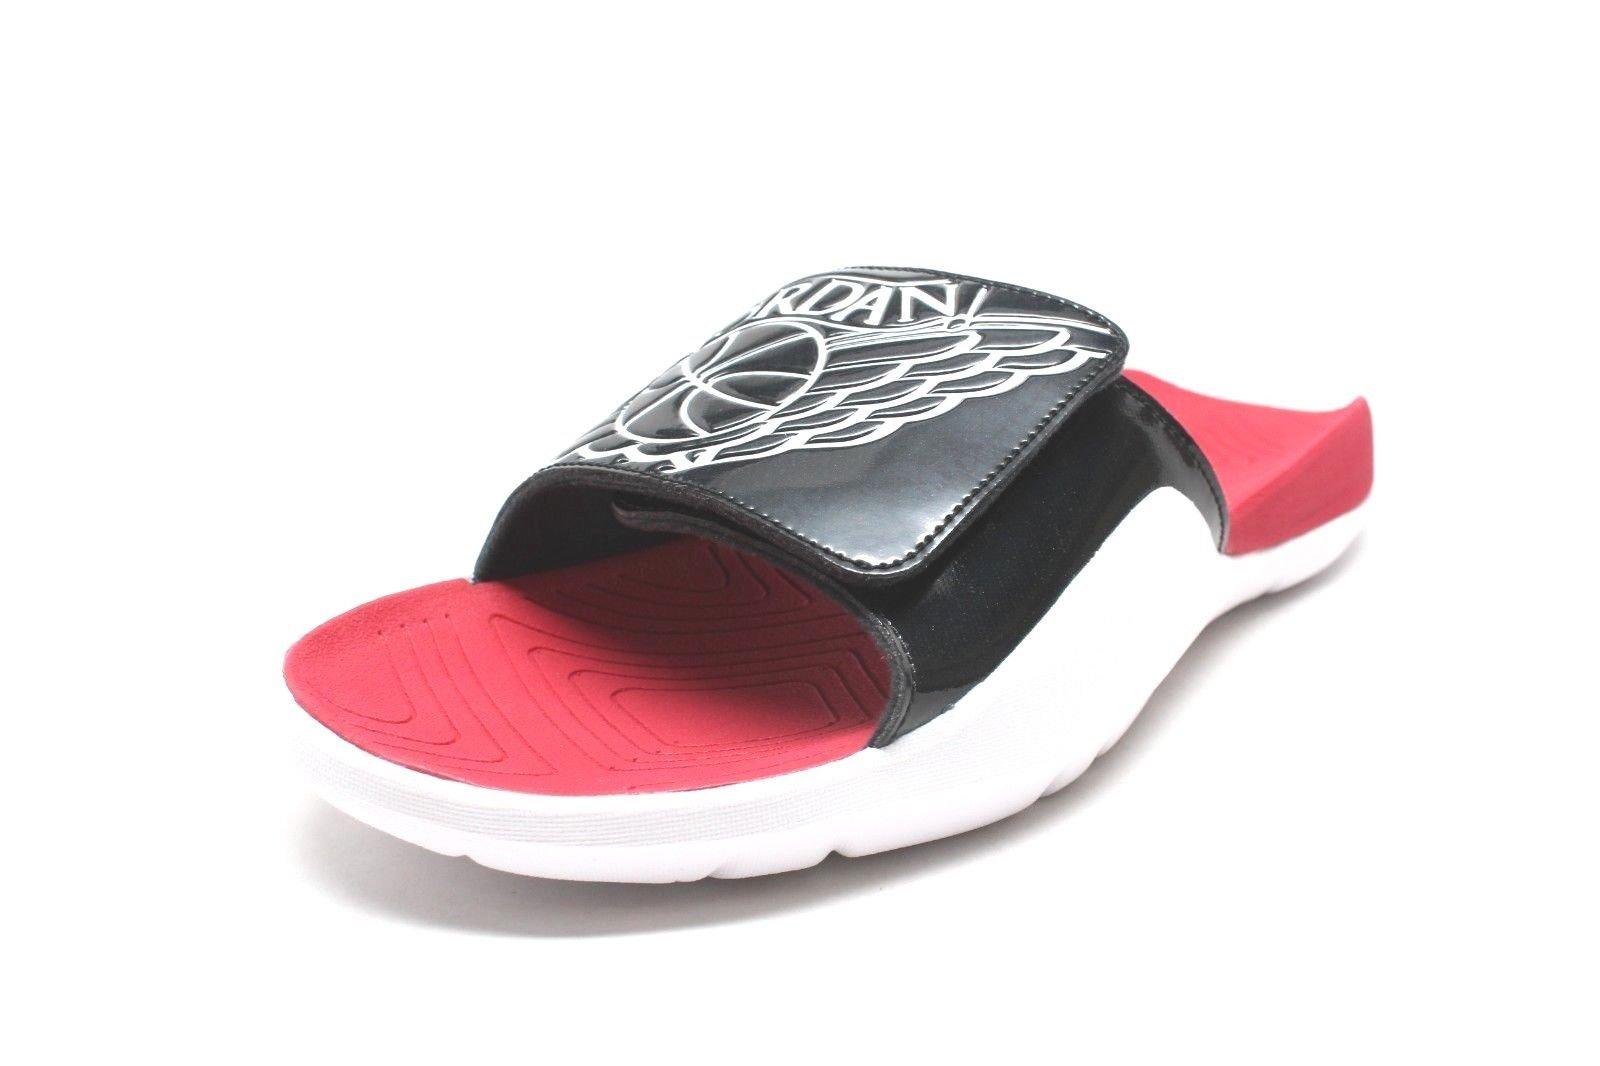 Jordan Hydro 7 Mens Slides Black/White/Gym Red/White aa2517-001 (8 M US)